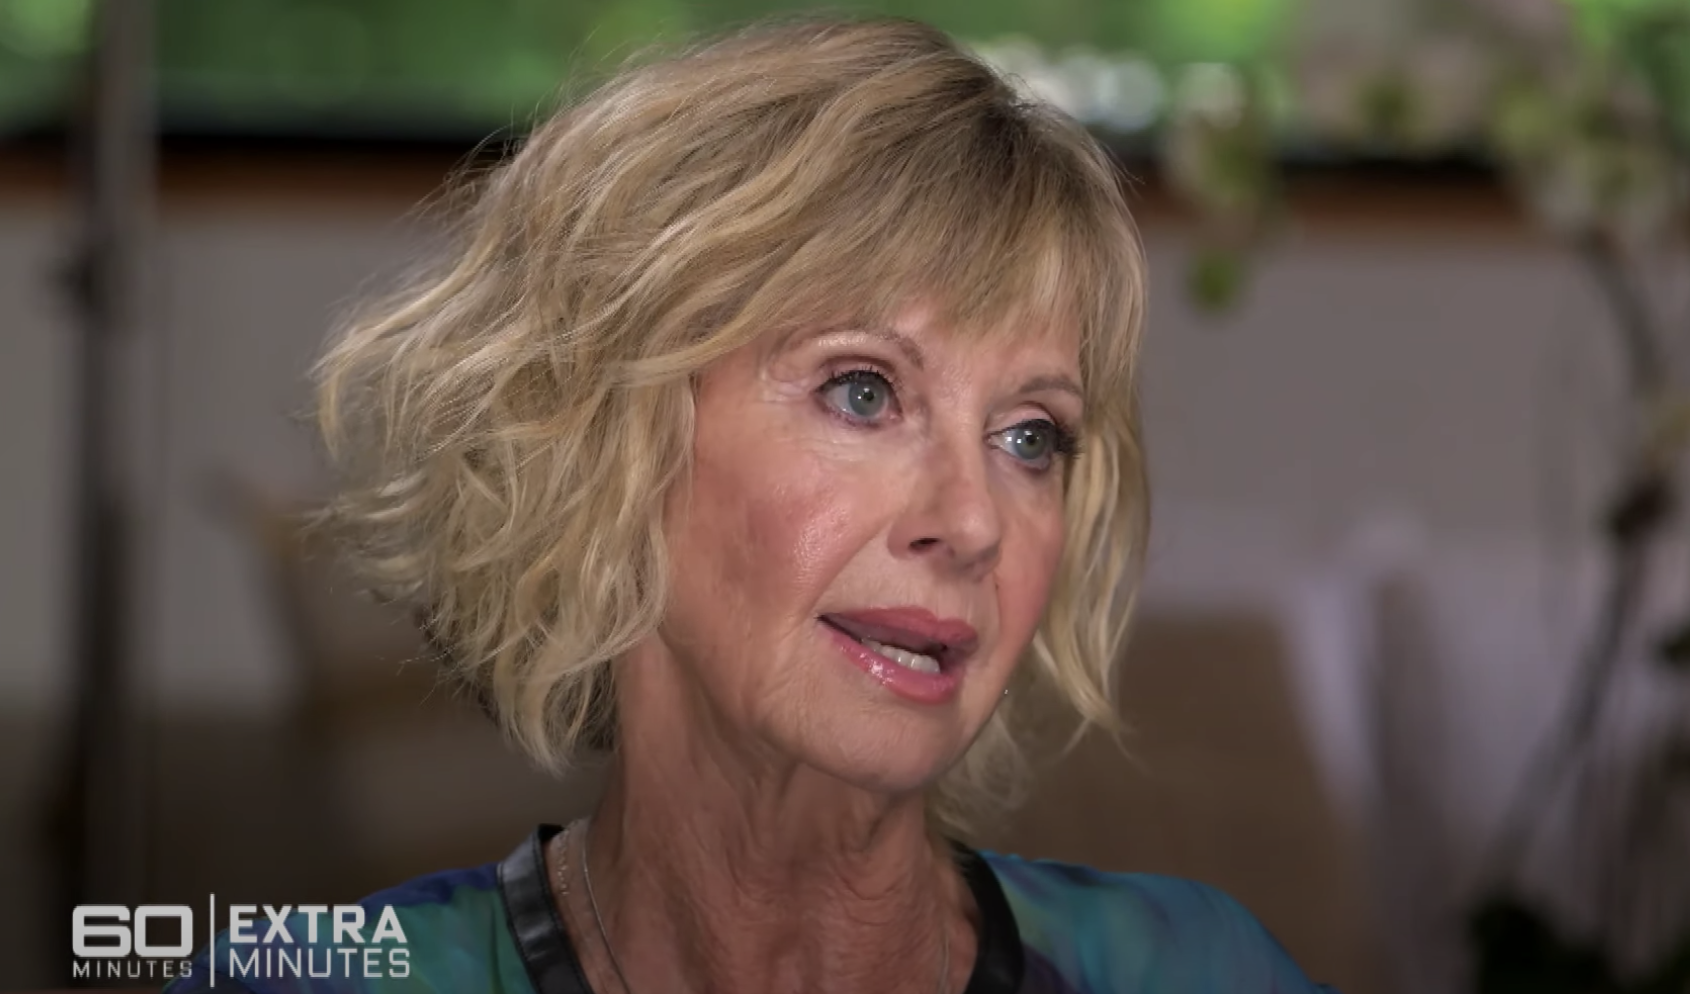 Olivia Newton-John Calls Experiencing Cancer 'A Gift'